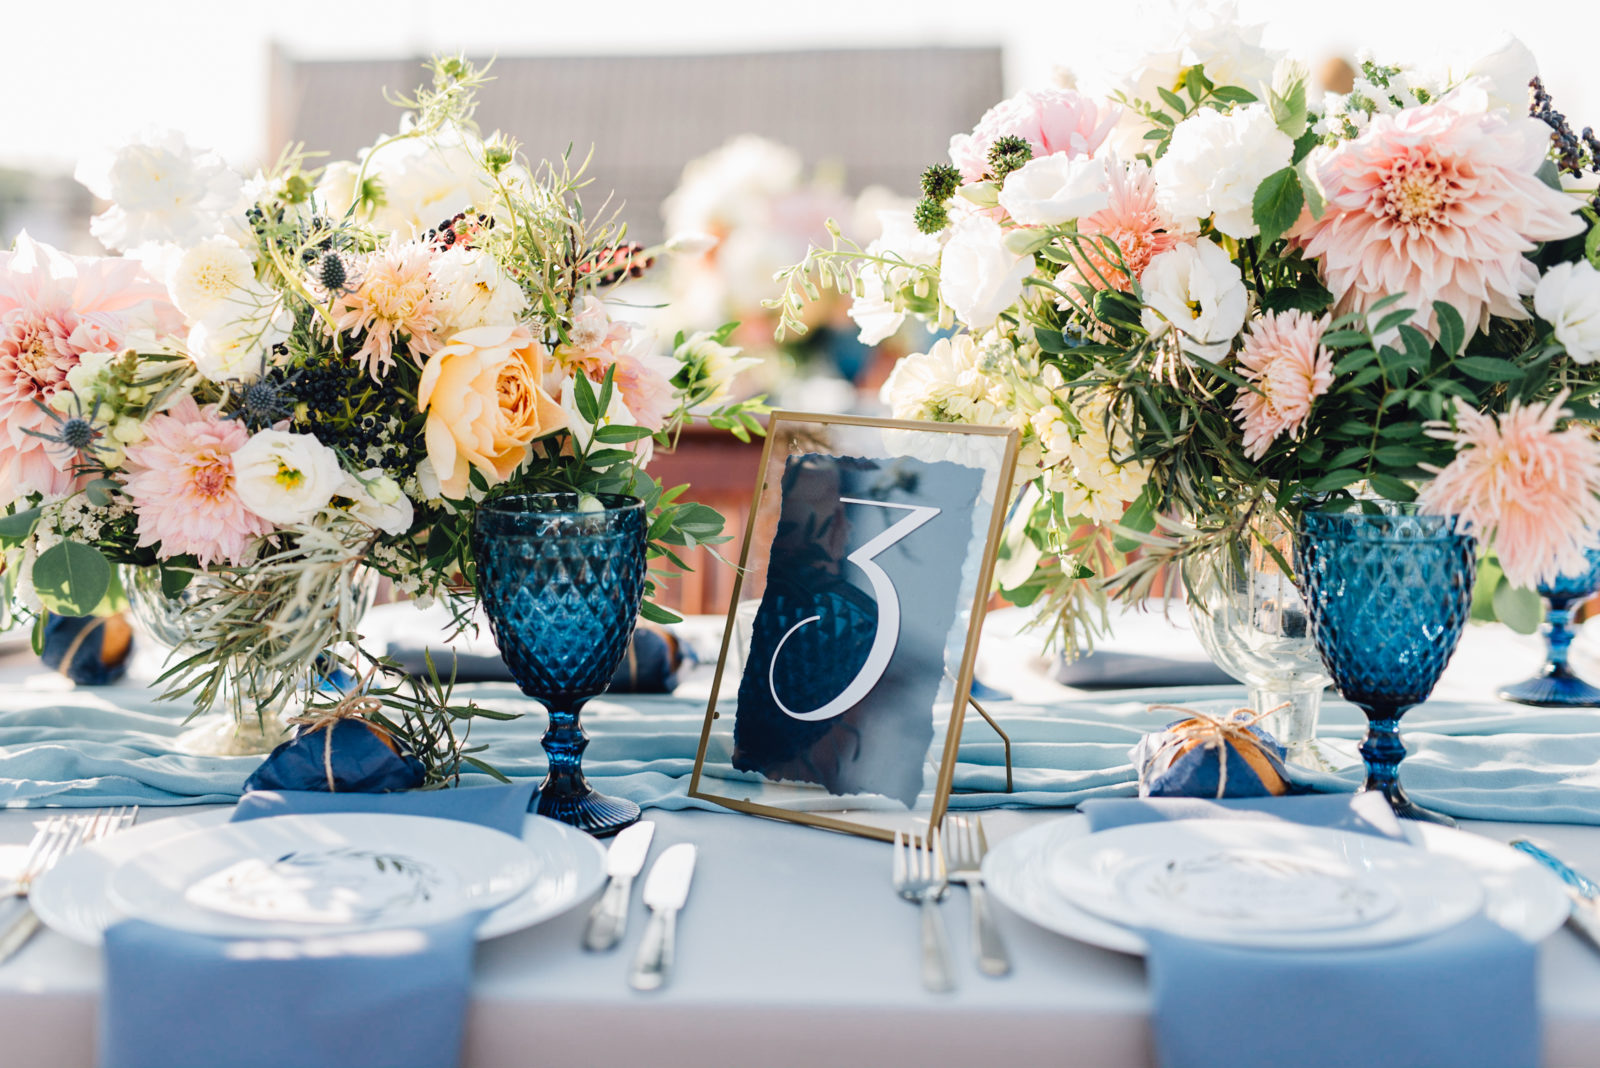 Wedding Rental Supplies Worksheet